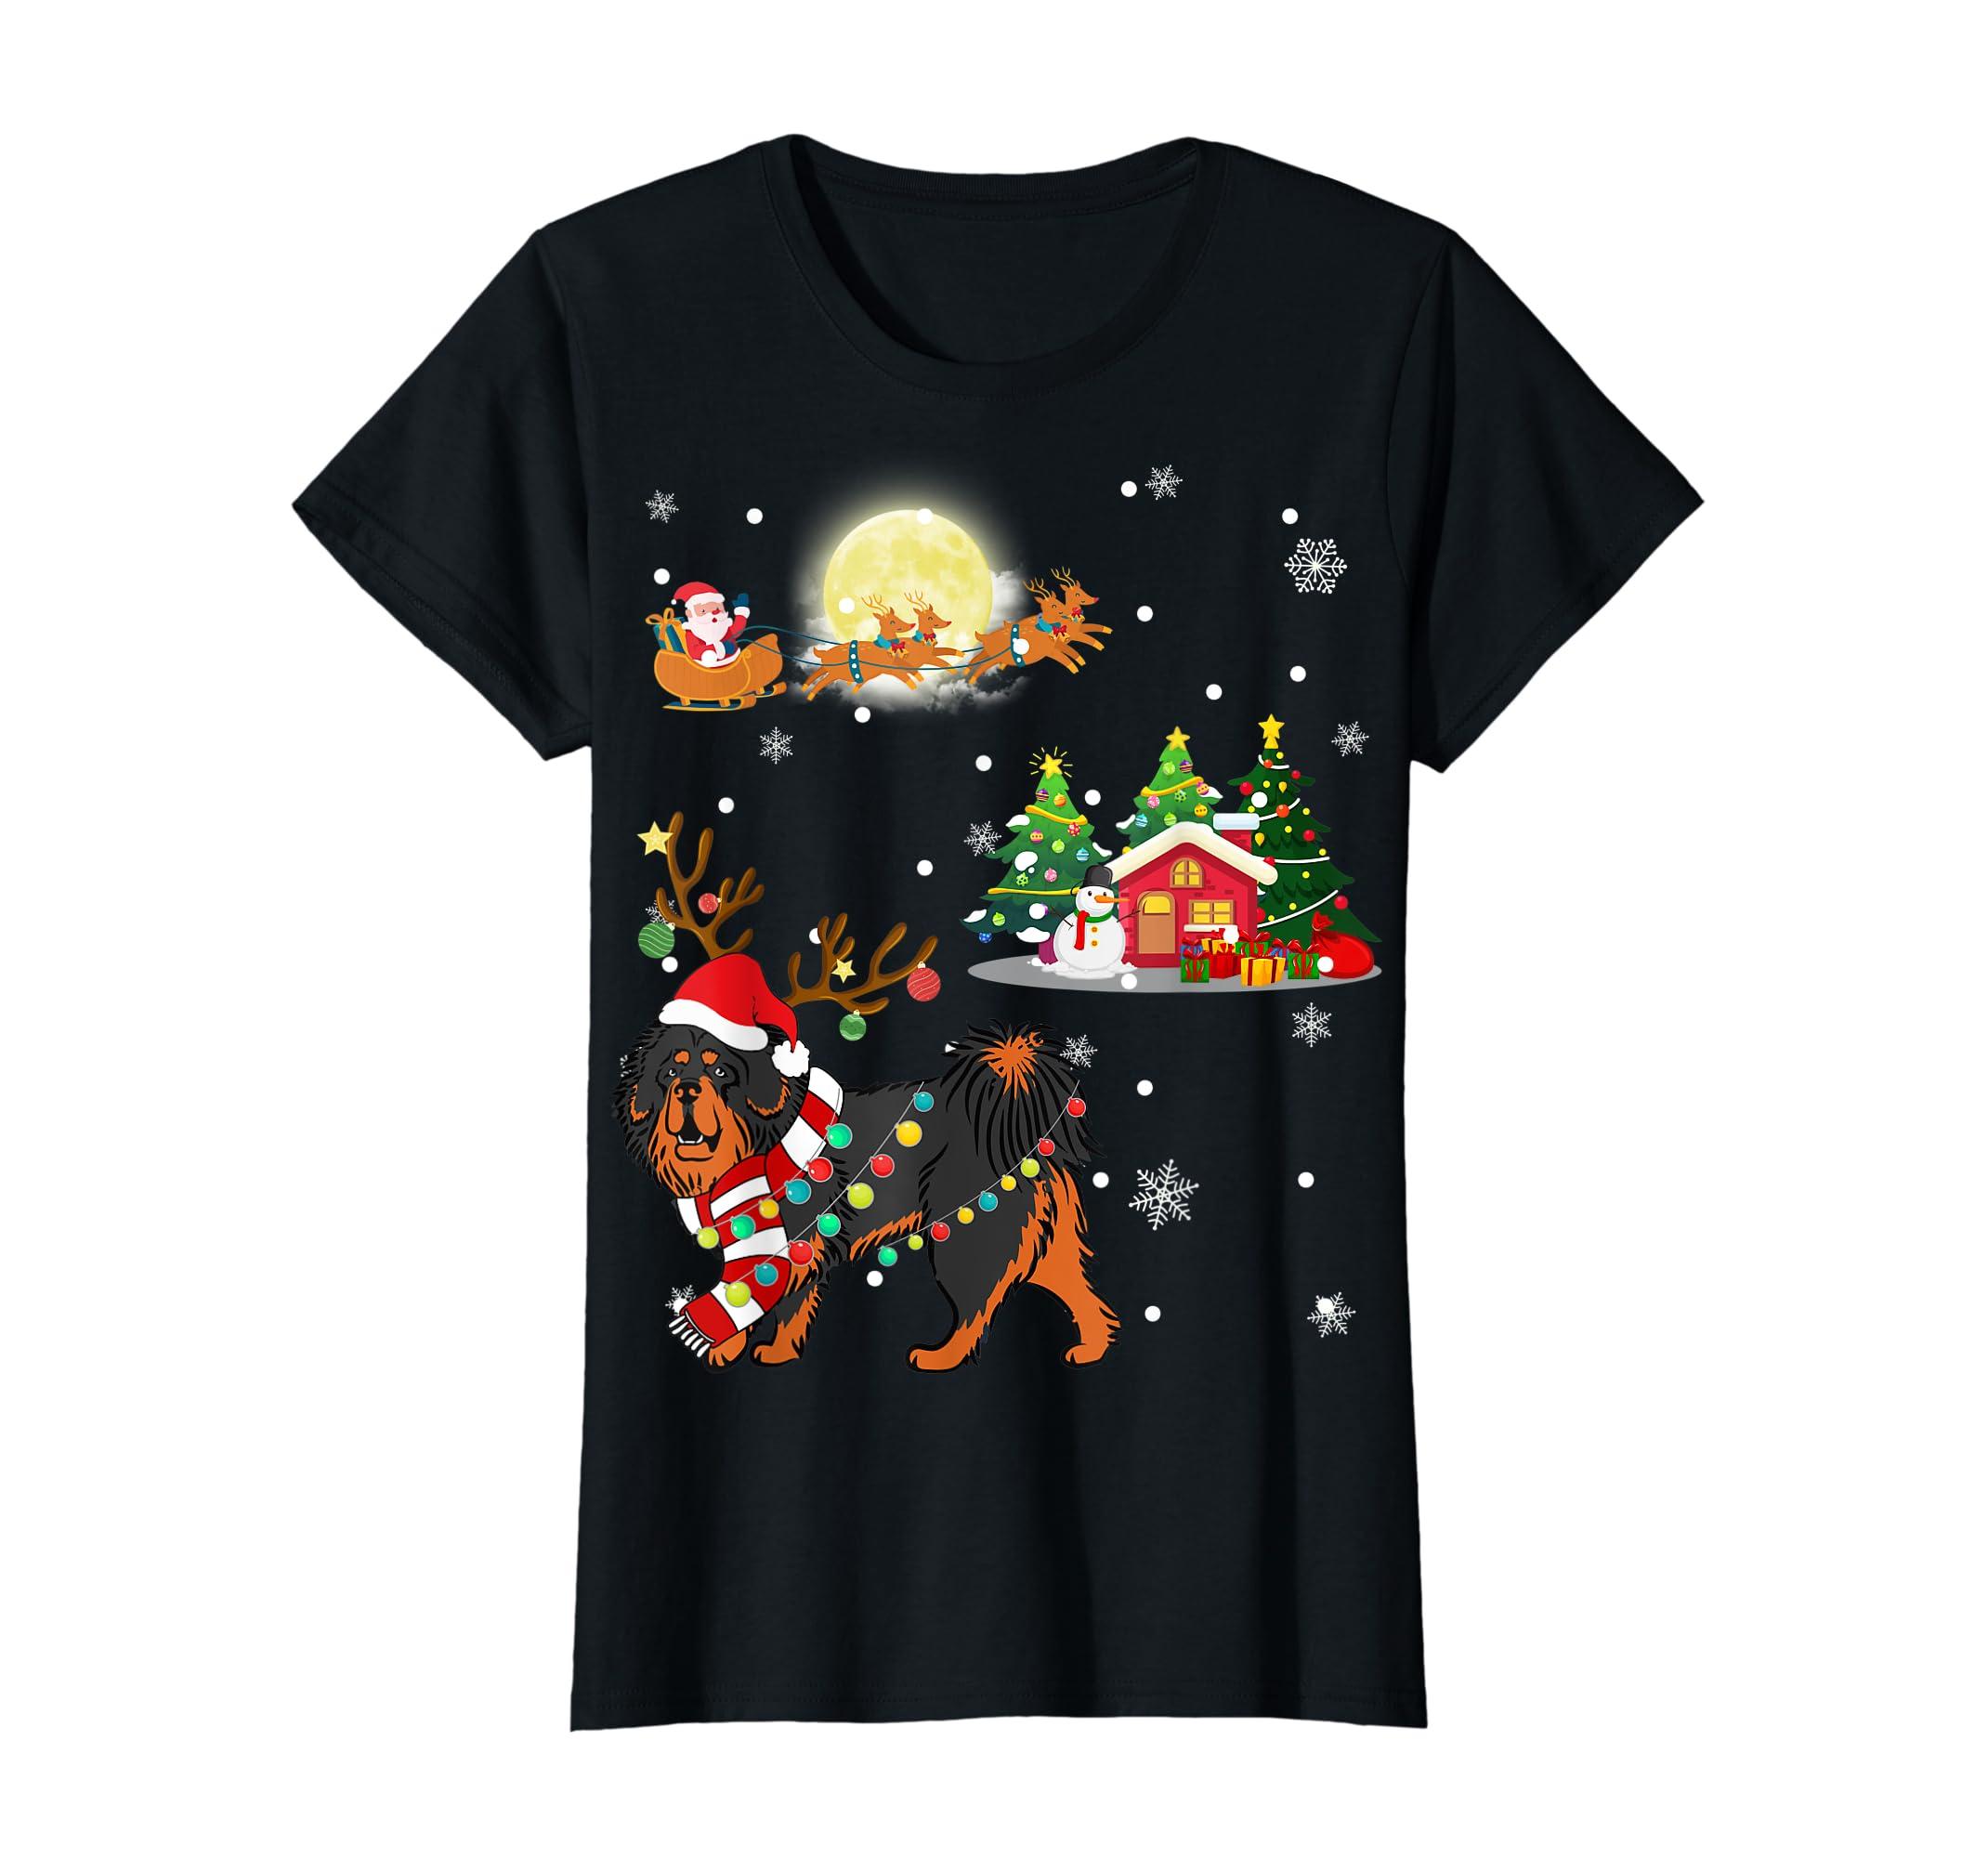 Tibetan Mastiff Dog Led Light Christmas 2019 Gift T-Shirt-Women's T-Shirt-Black